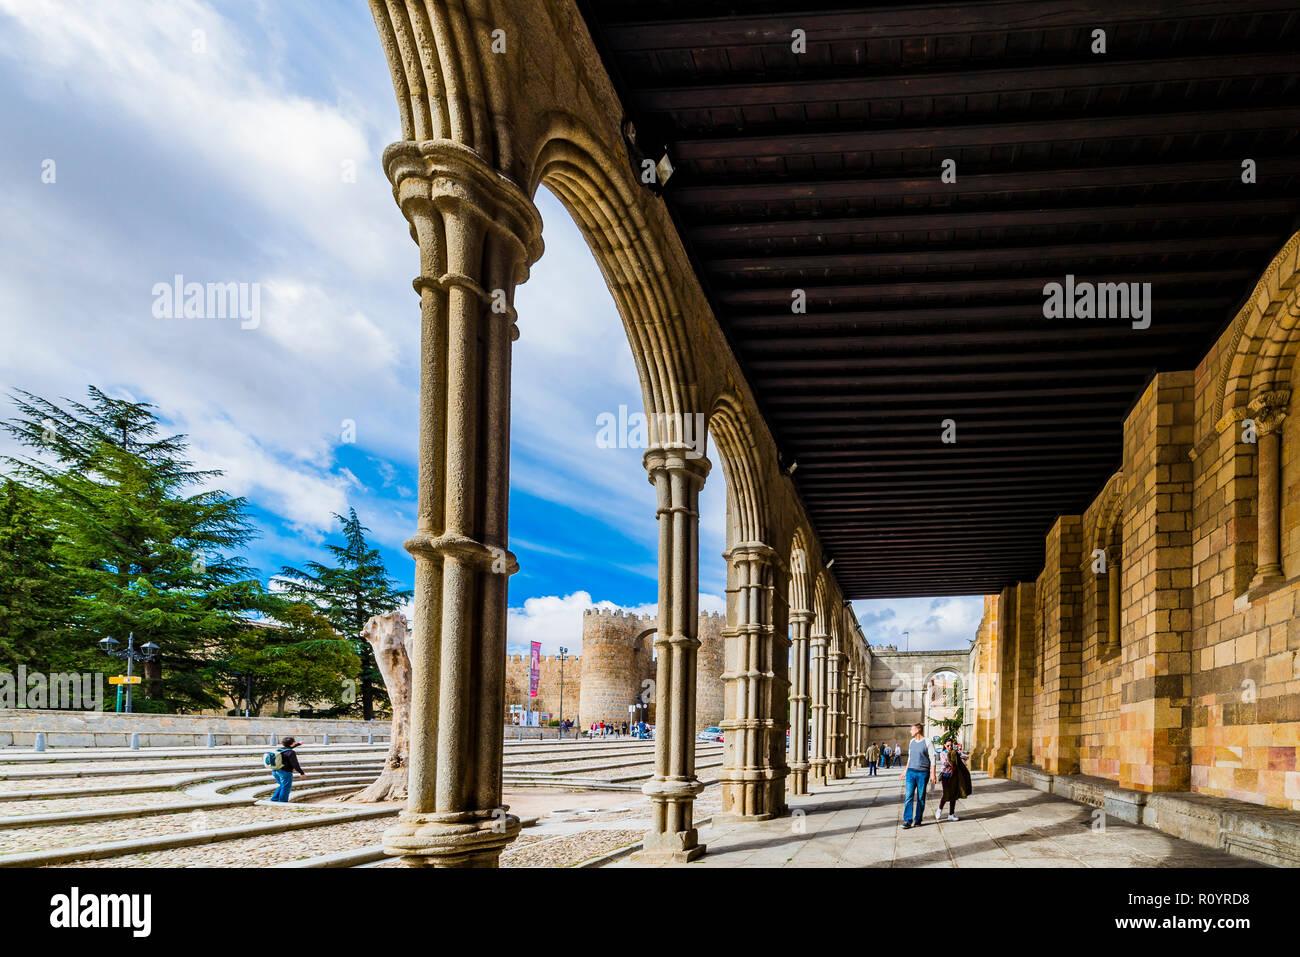 Arcaded gallery, southern facade, Basilica de San Vicente, Romanesque architecture, romanesque architecture, Avila, southern, portal,Castilla y Leon,  - Stock Image